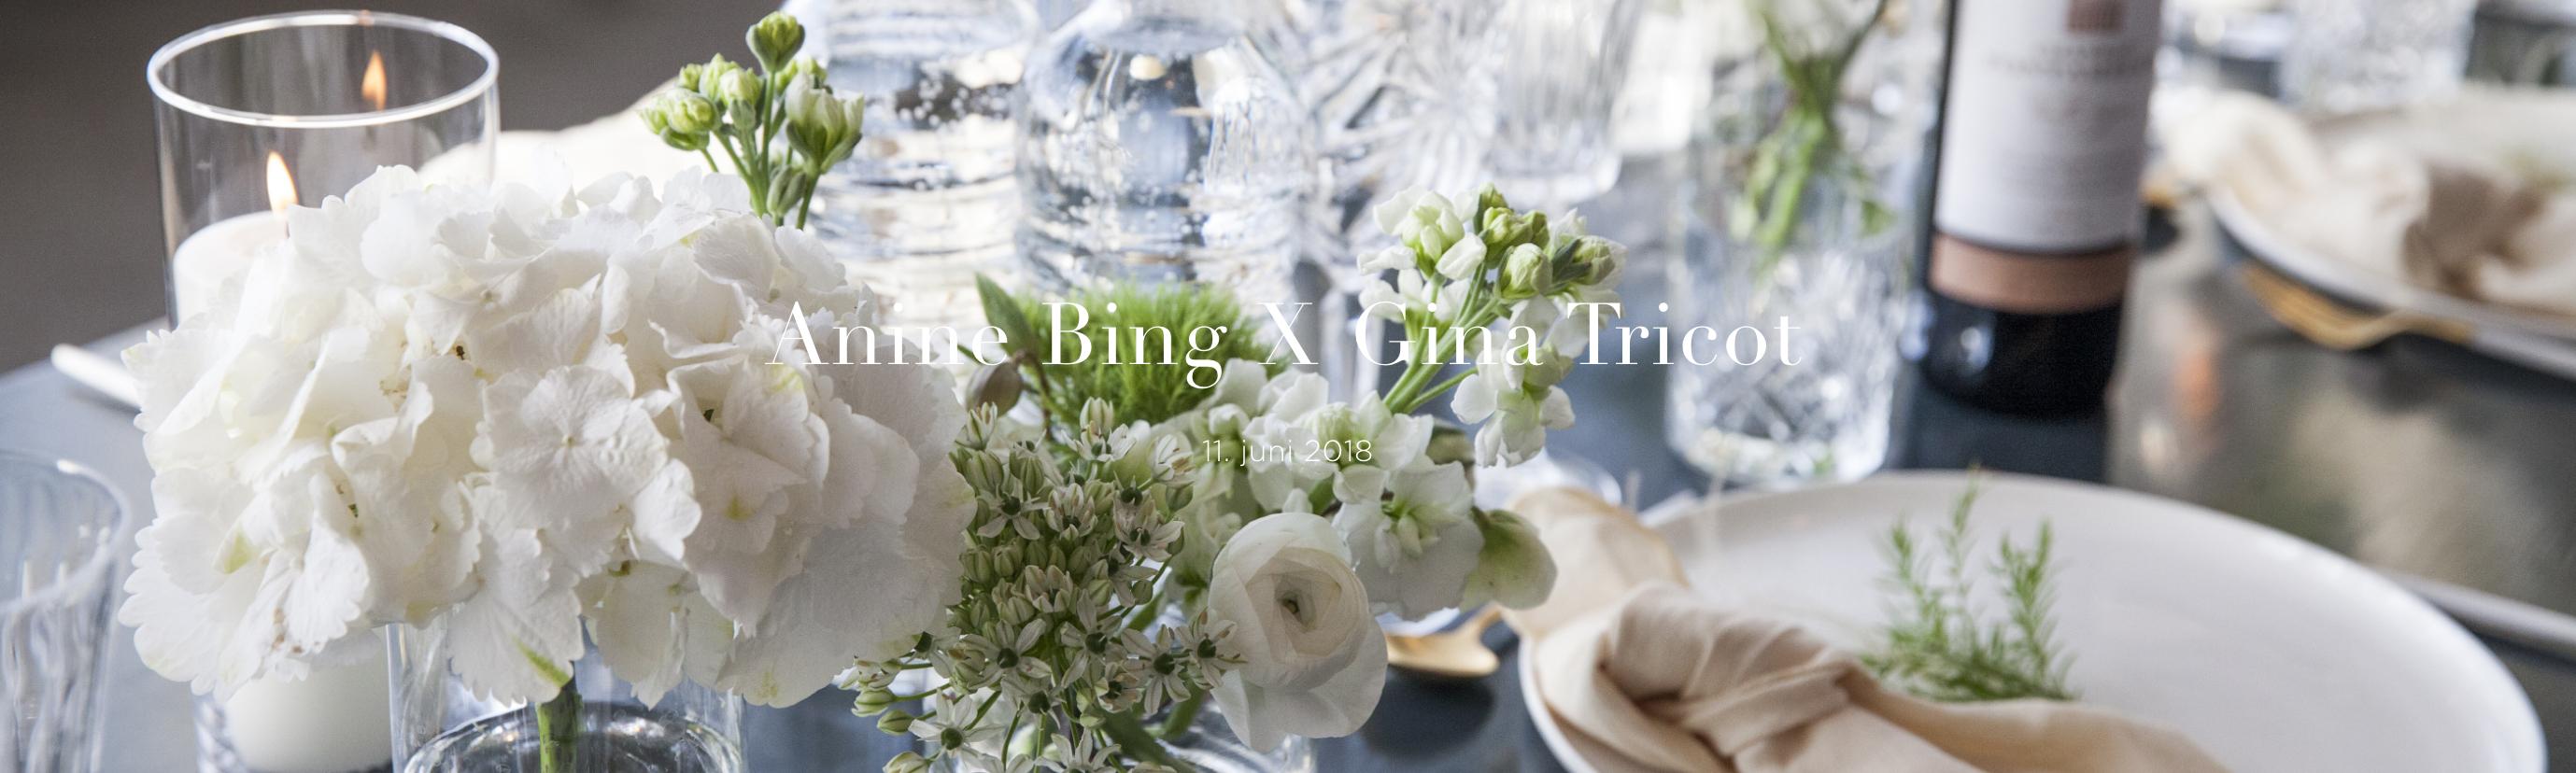 AnineBingXGinaTricotdinner_SocialZoo_HelenaLundquist_banner